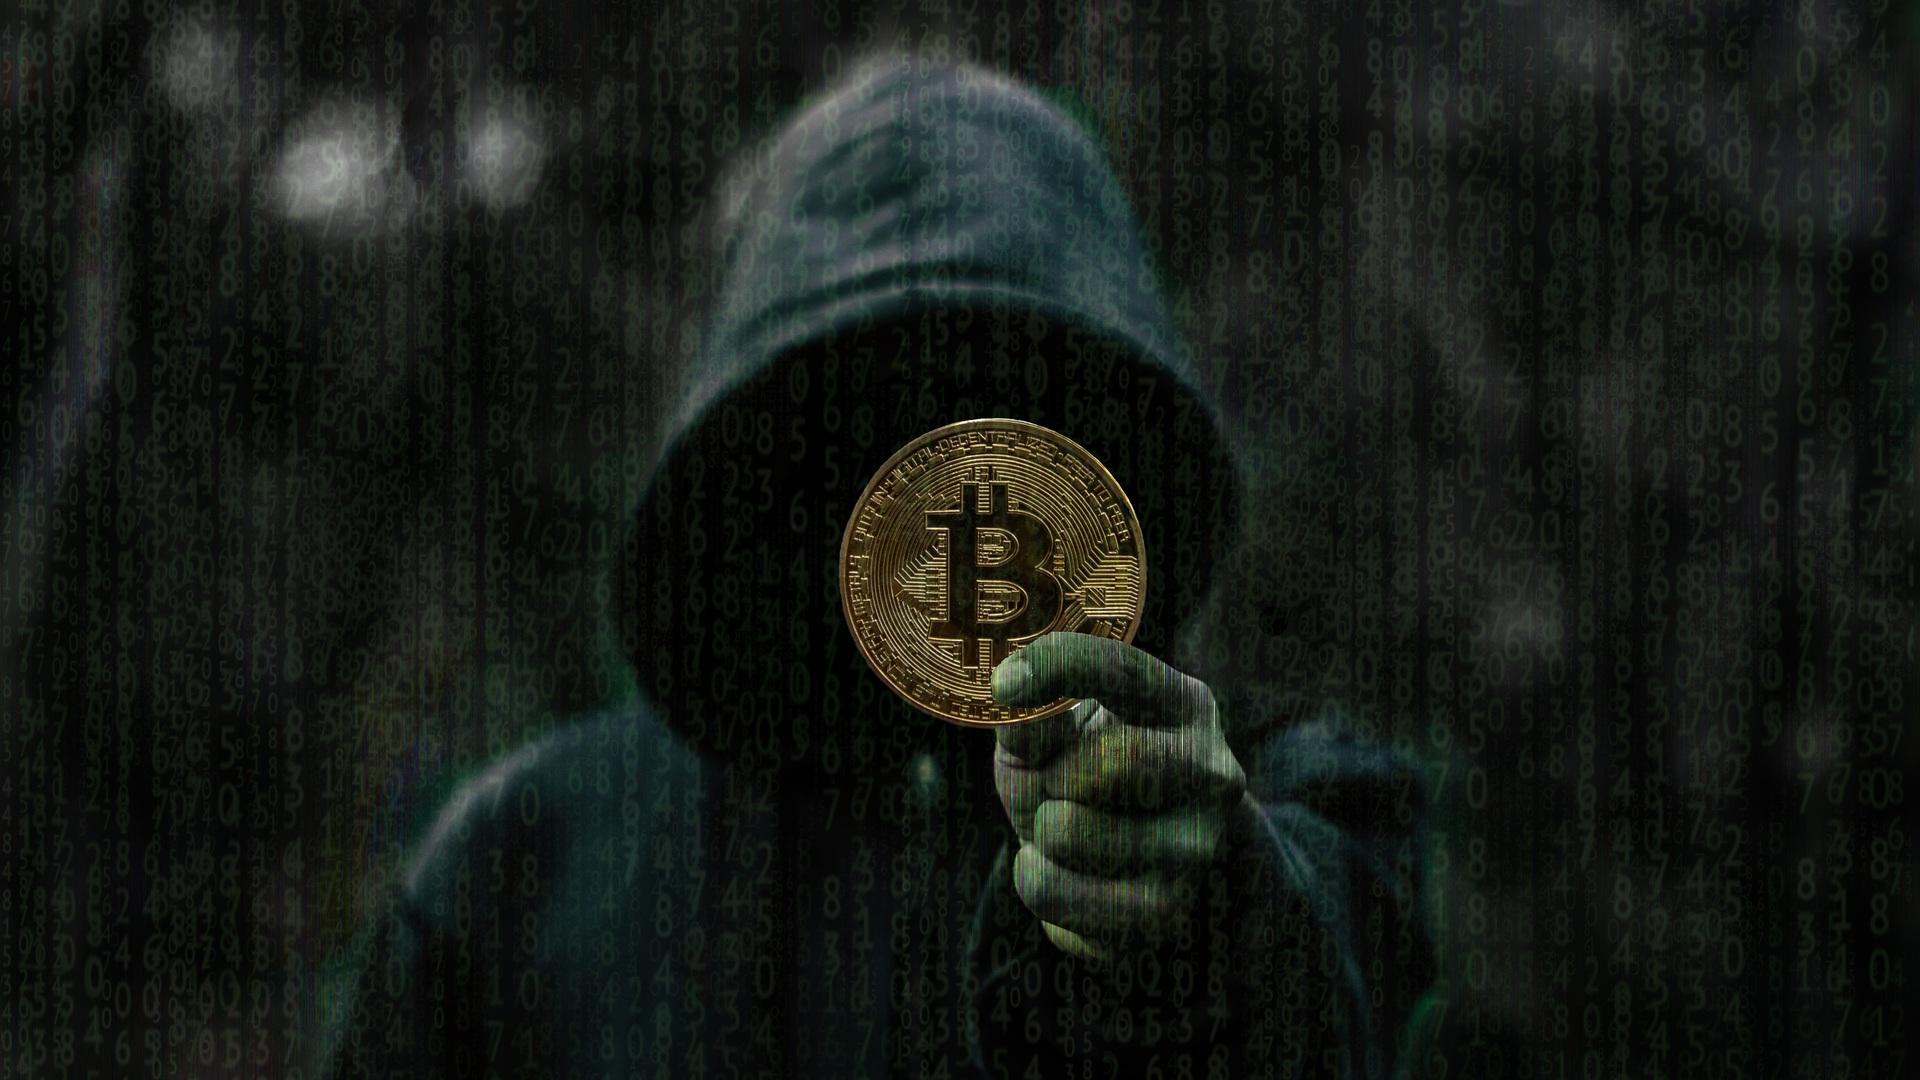 Cryptocurrency pi currency Bitcoin عملات رقمية تعدين العملات